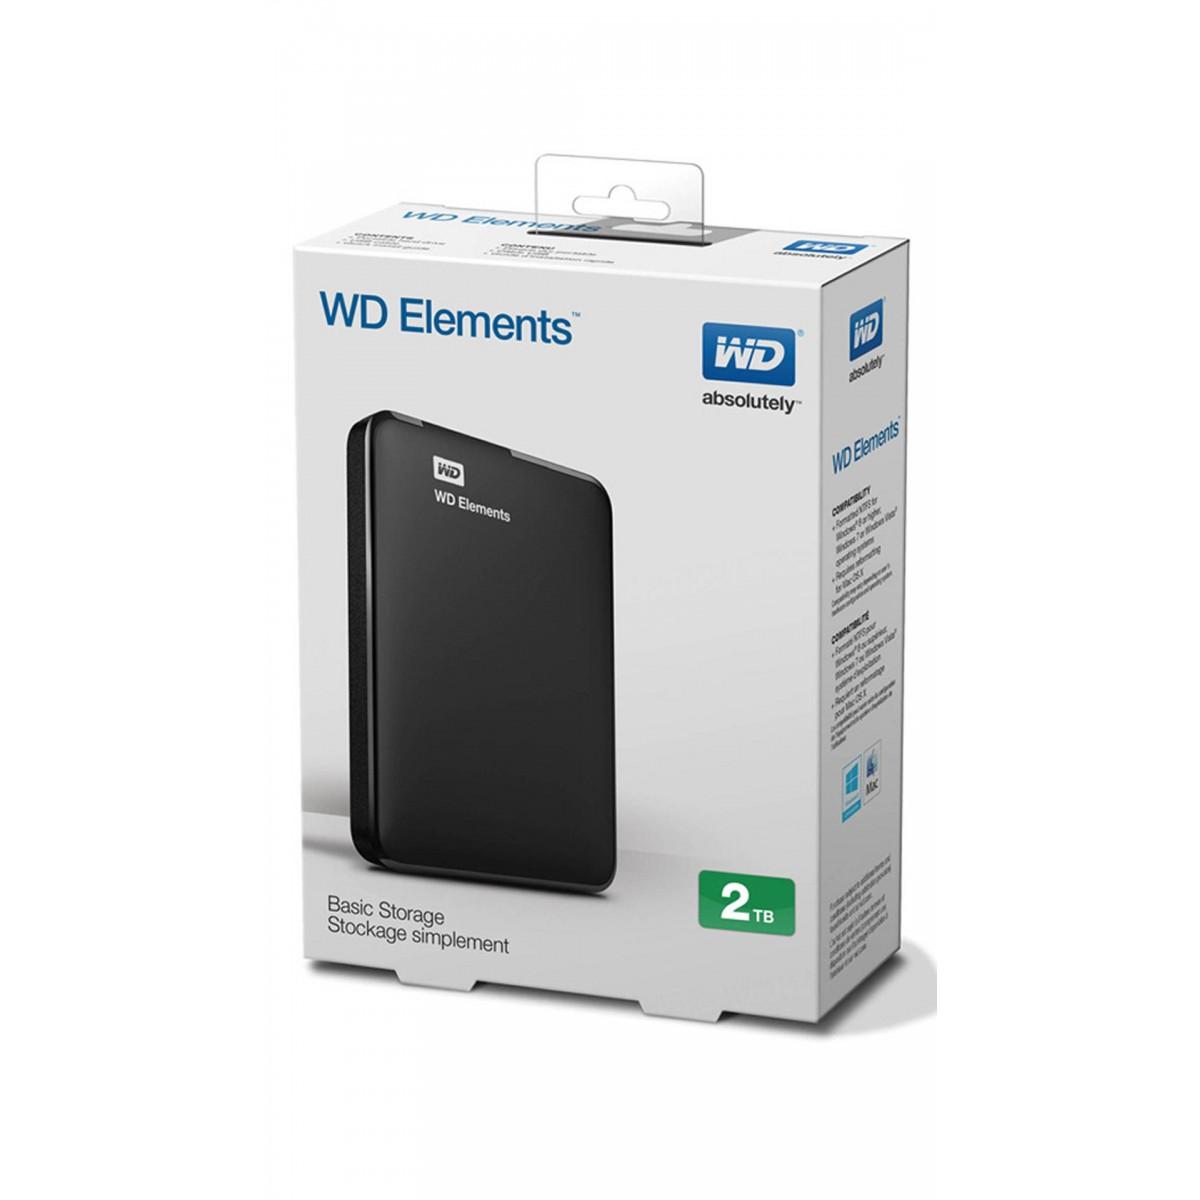 WD 2TB Elements External USB3.0 hard drive